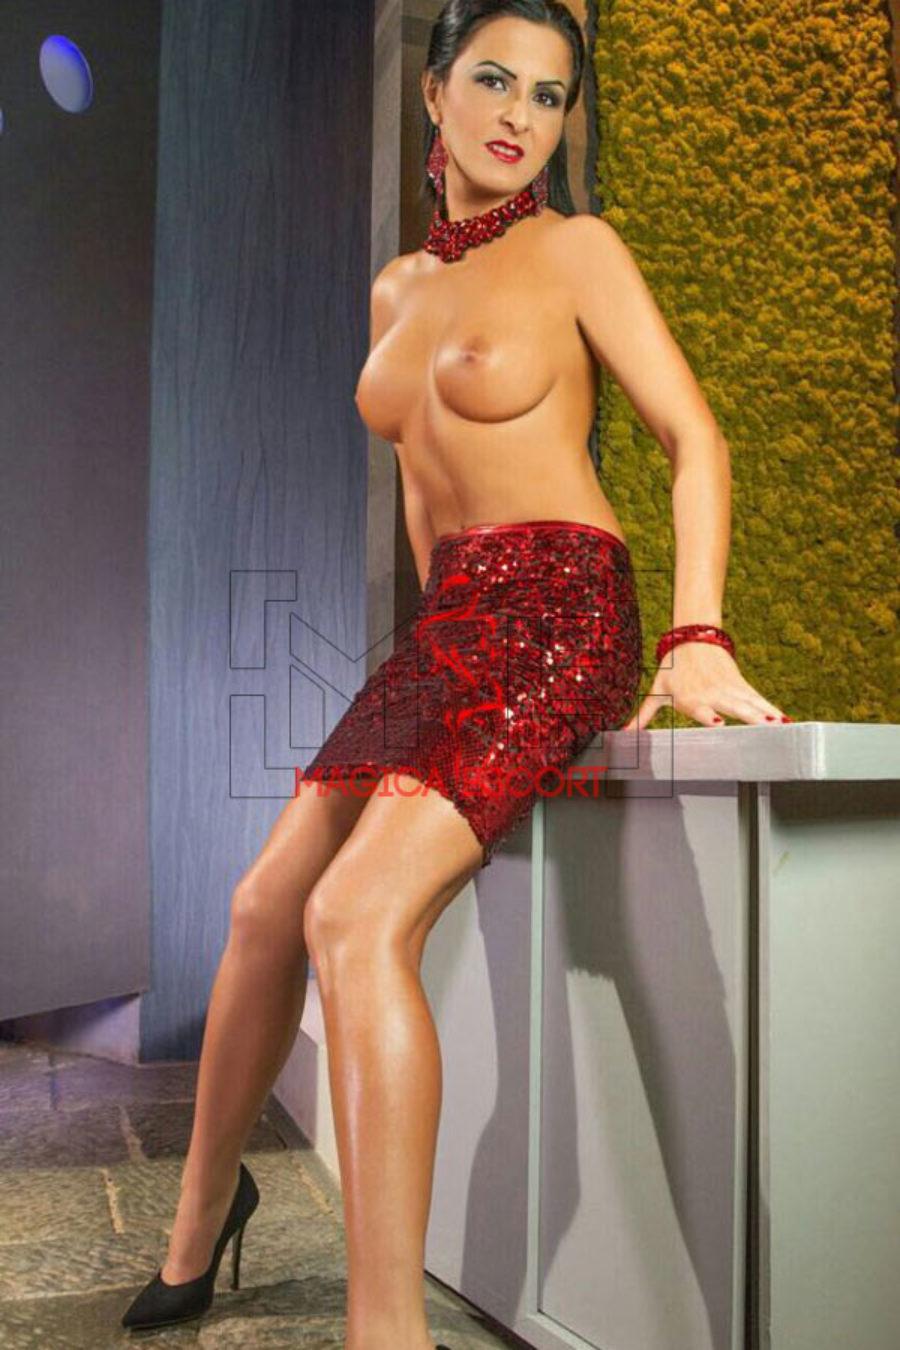 Evelyn-escort-Parma-1.jpg